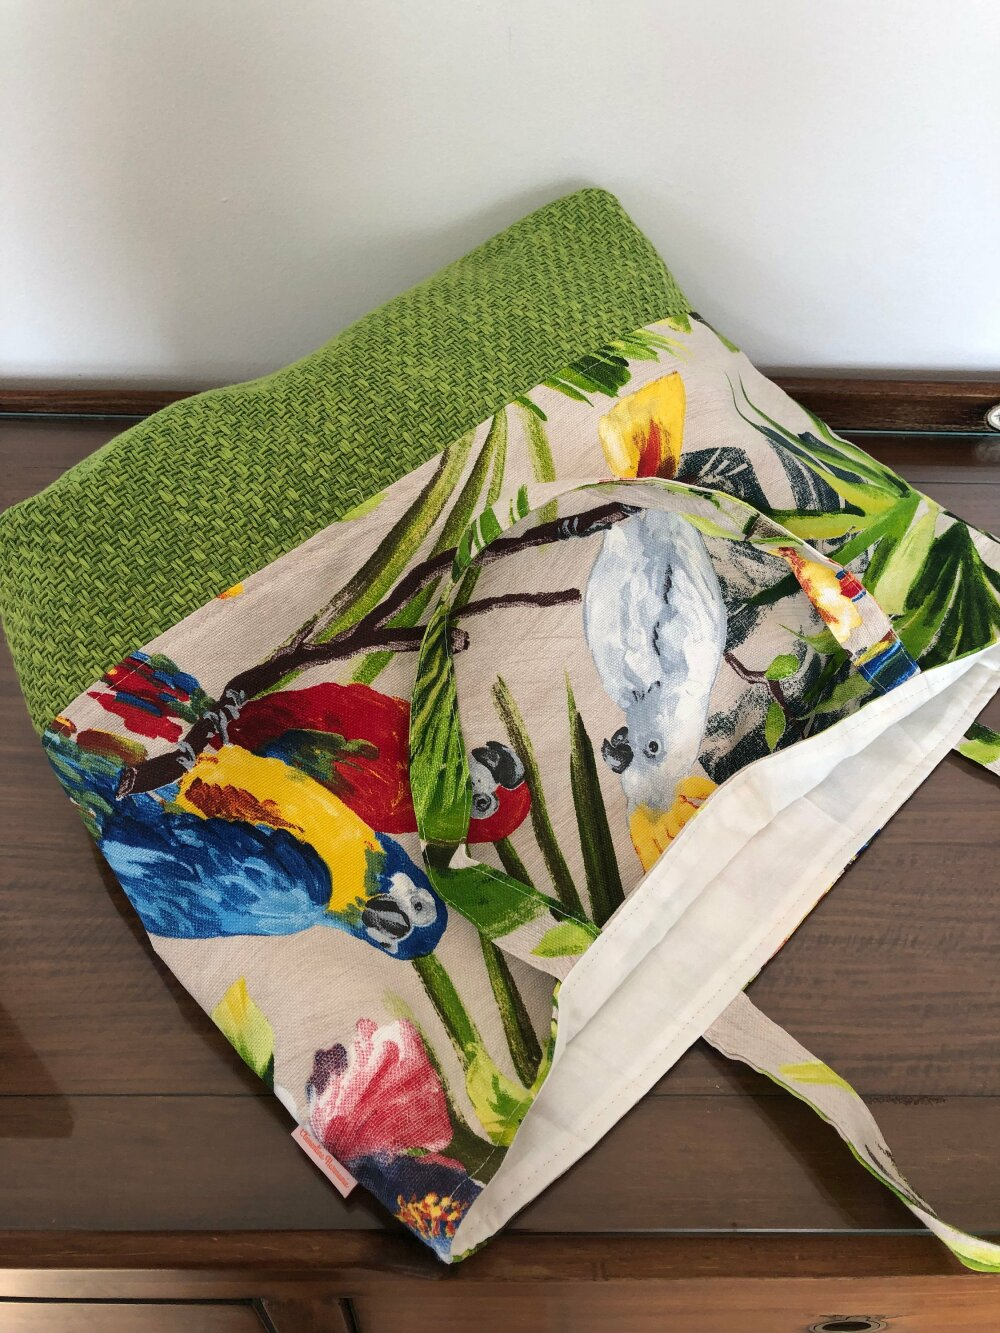 sac de plage, cabas, sac de courses tissu imprimé tissu feuillage exotique et perroquet toucan